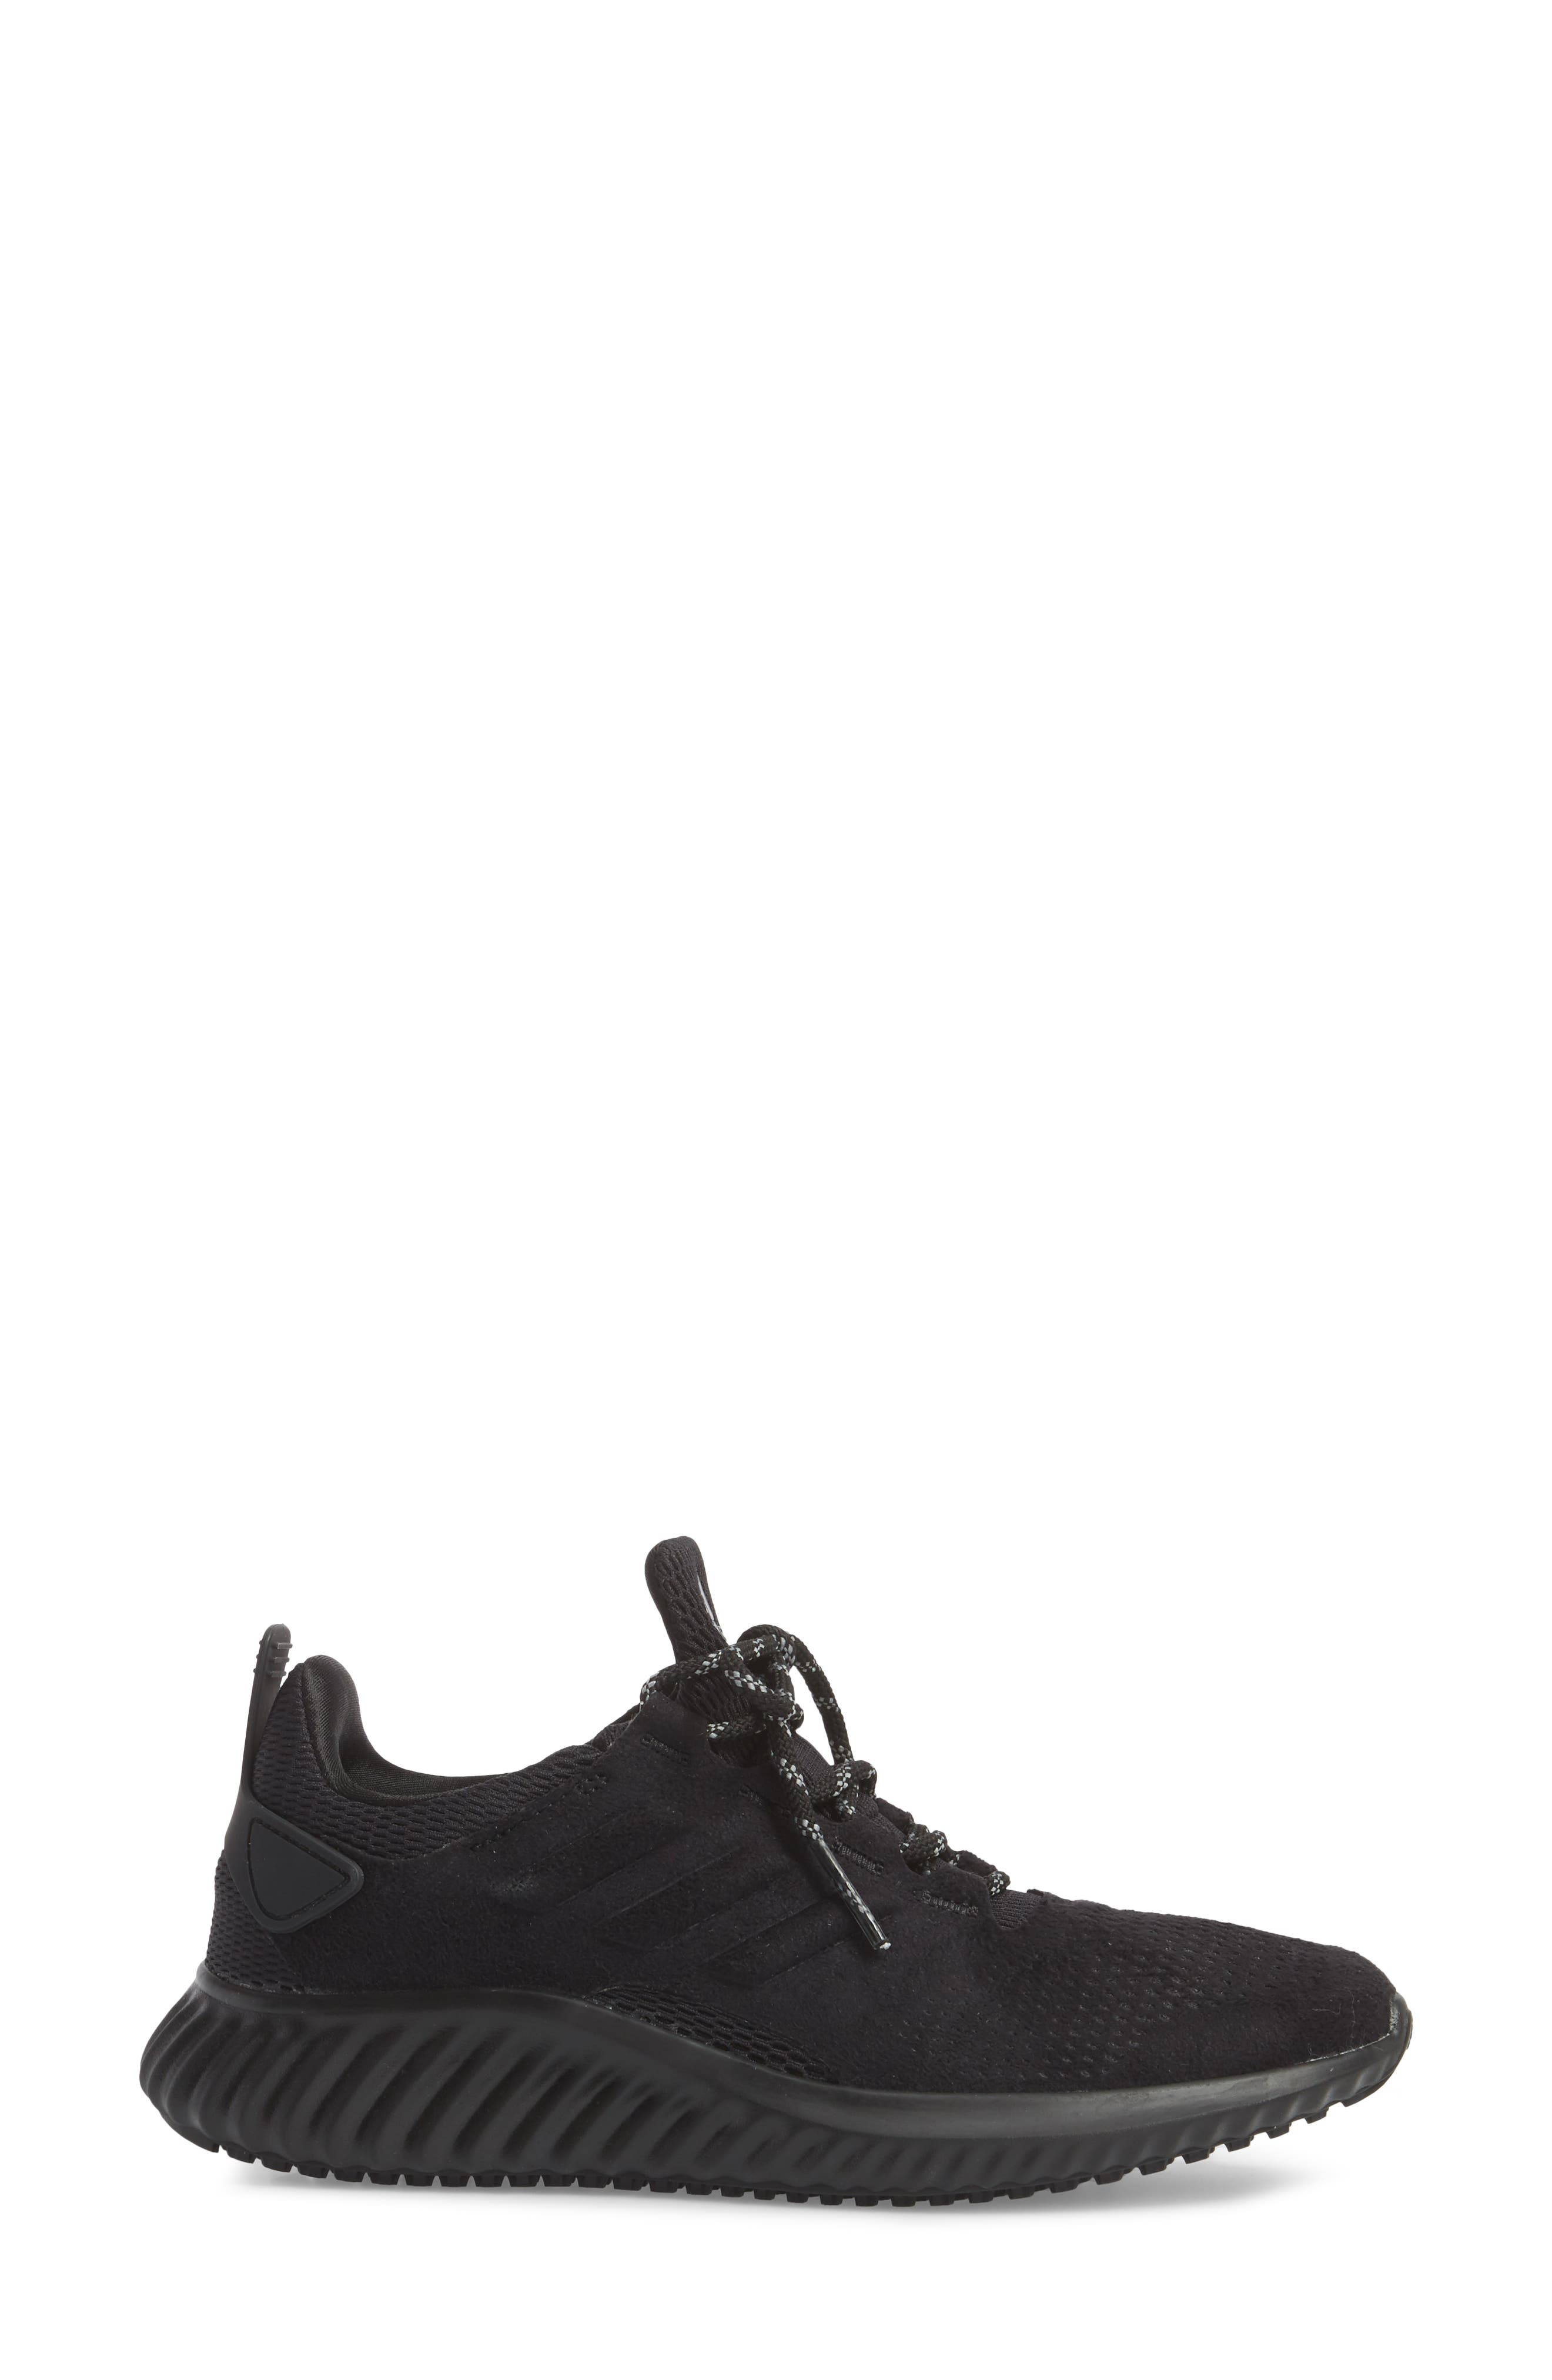 AlphaBounce CR Running Shoe,                             Alternate thumbnail 3, color,                             CORE BLACK/ CORE BLACK